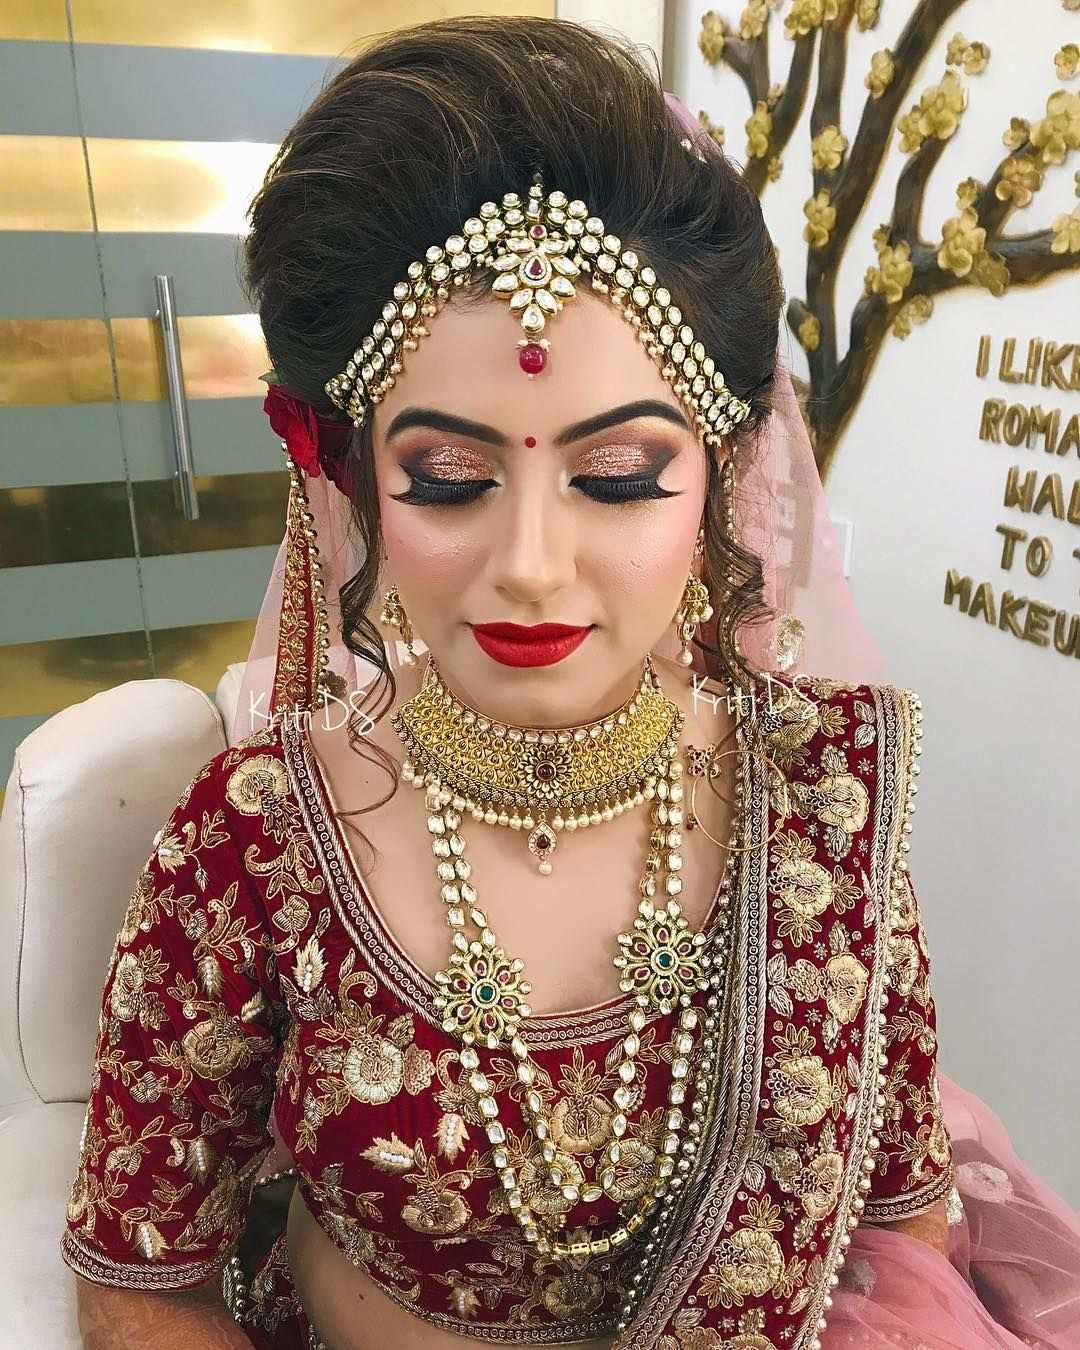 Wedding Hairstyles Asian: Pin By Diksha Sharma On Brides In 2019